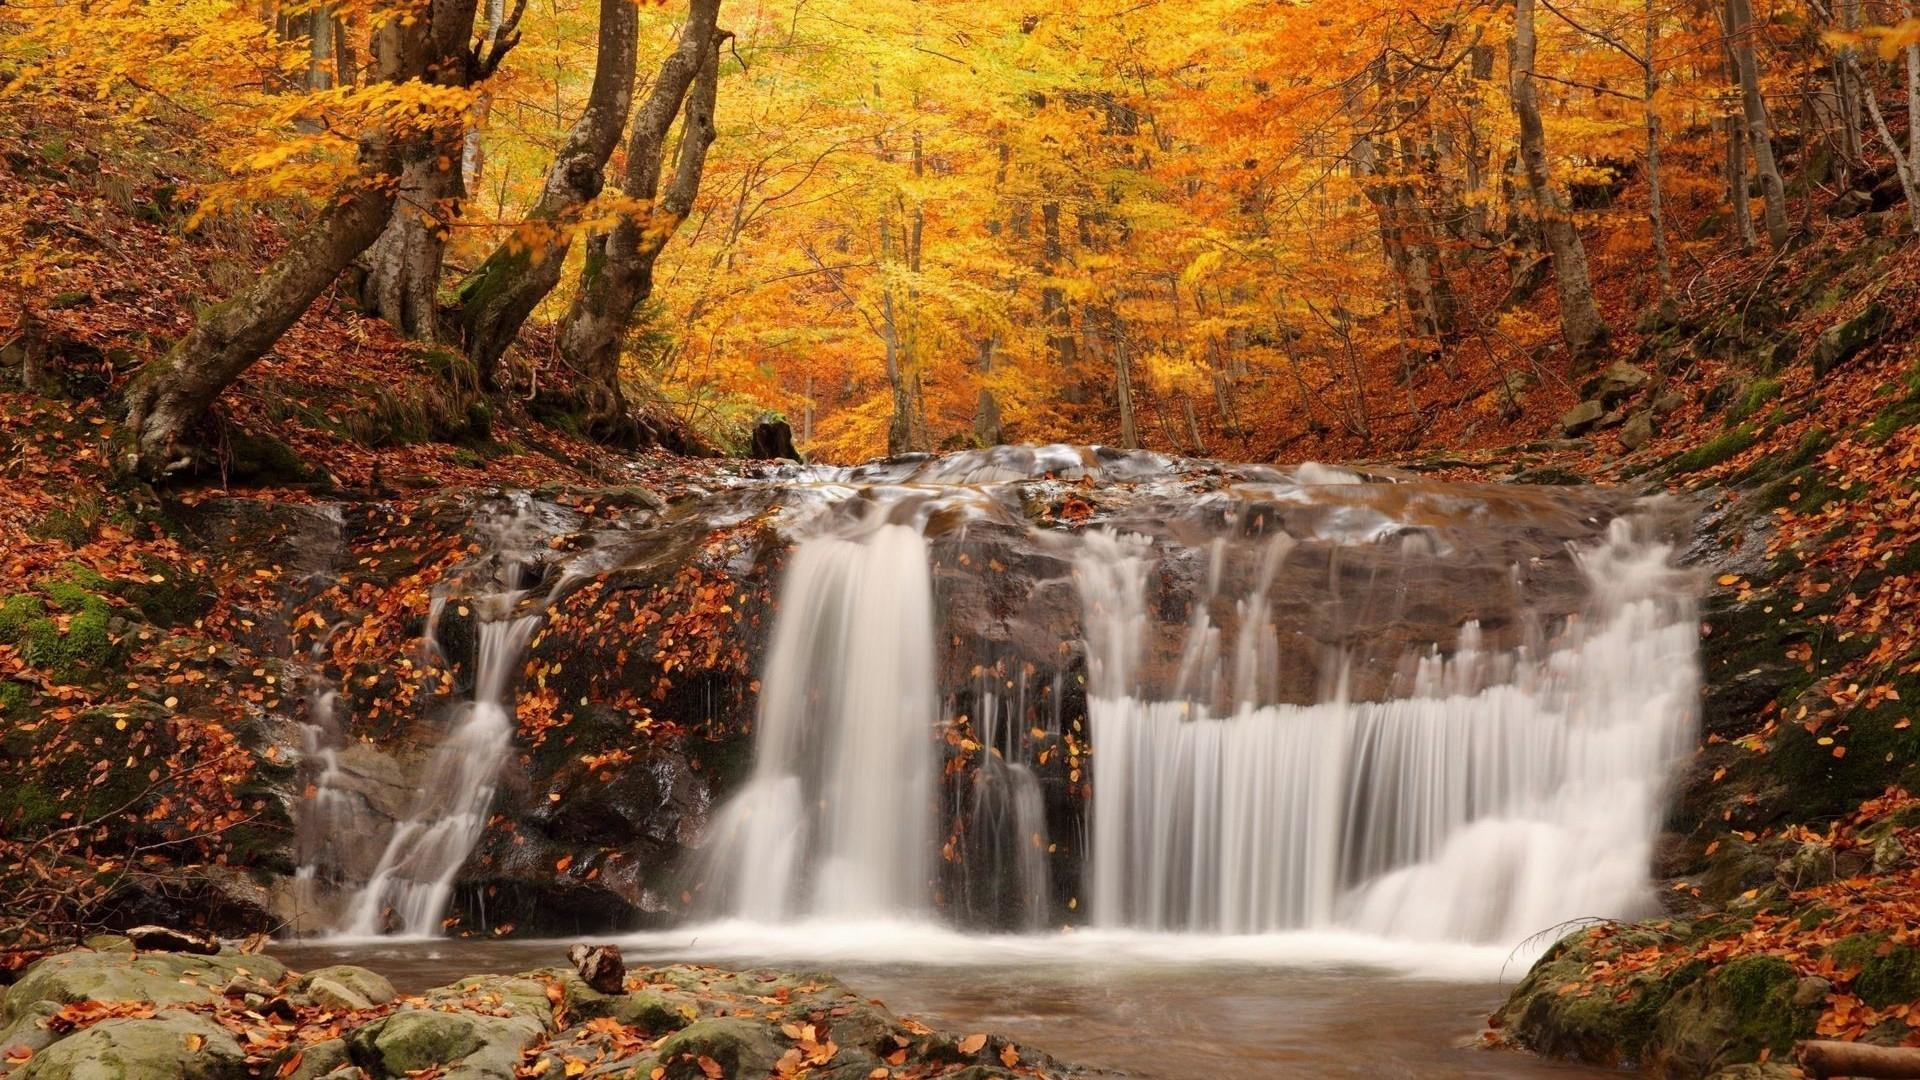 wallpaper.wiki-Fall-Desktop-Computer-Images-Screen-PIC-